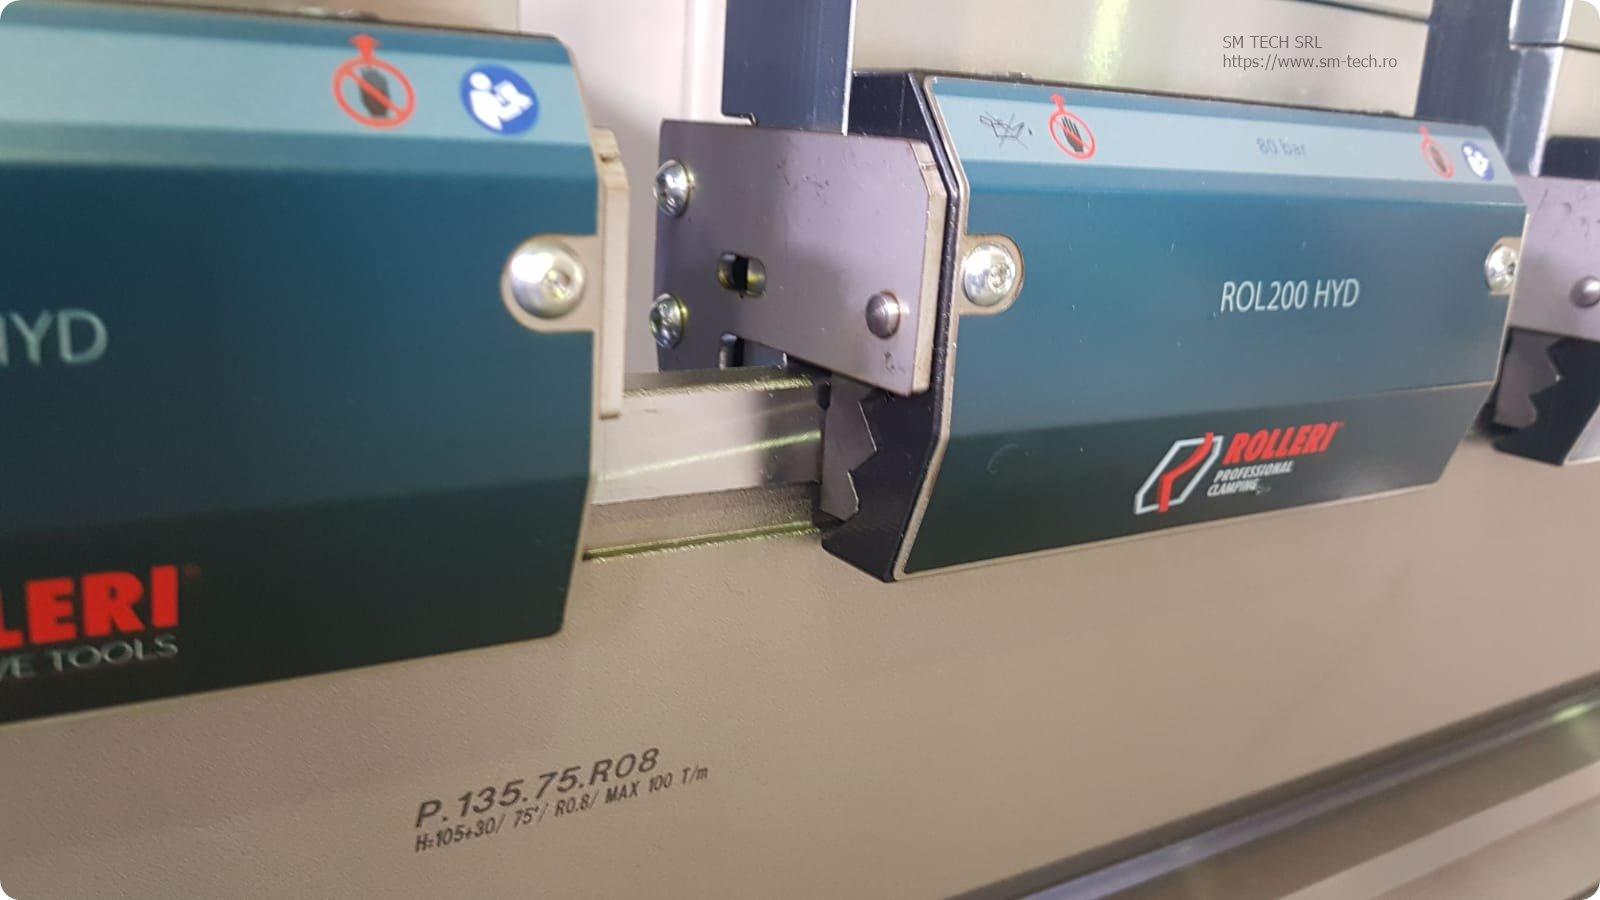 Intermediari prindere rapida hidraulica Rolleri ROL200 HYD